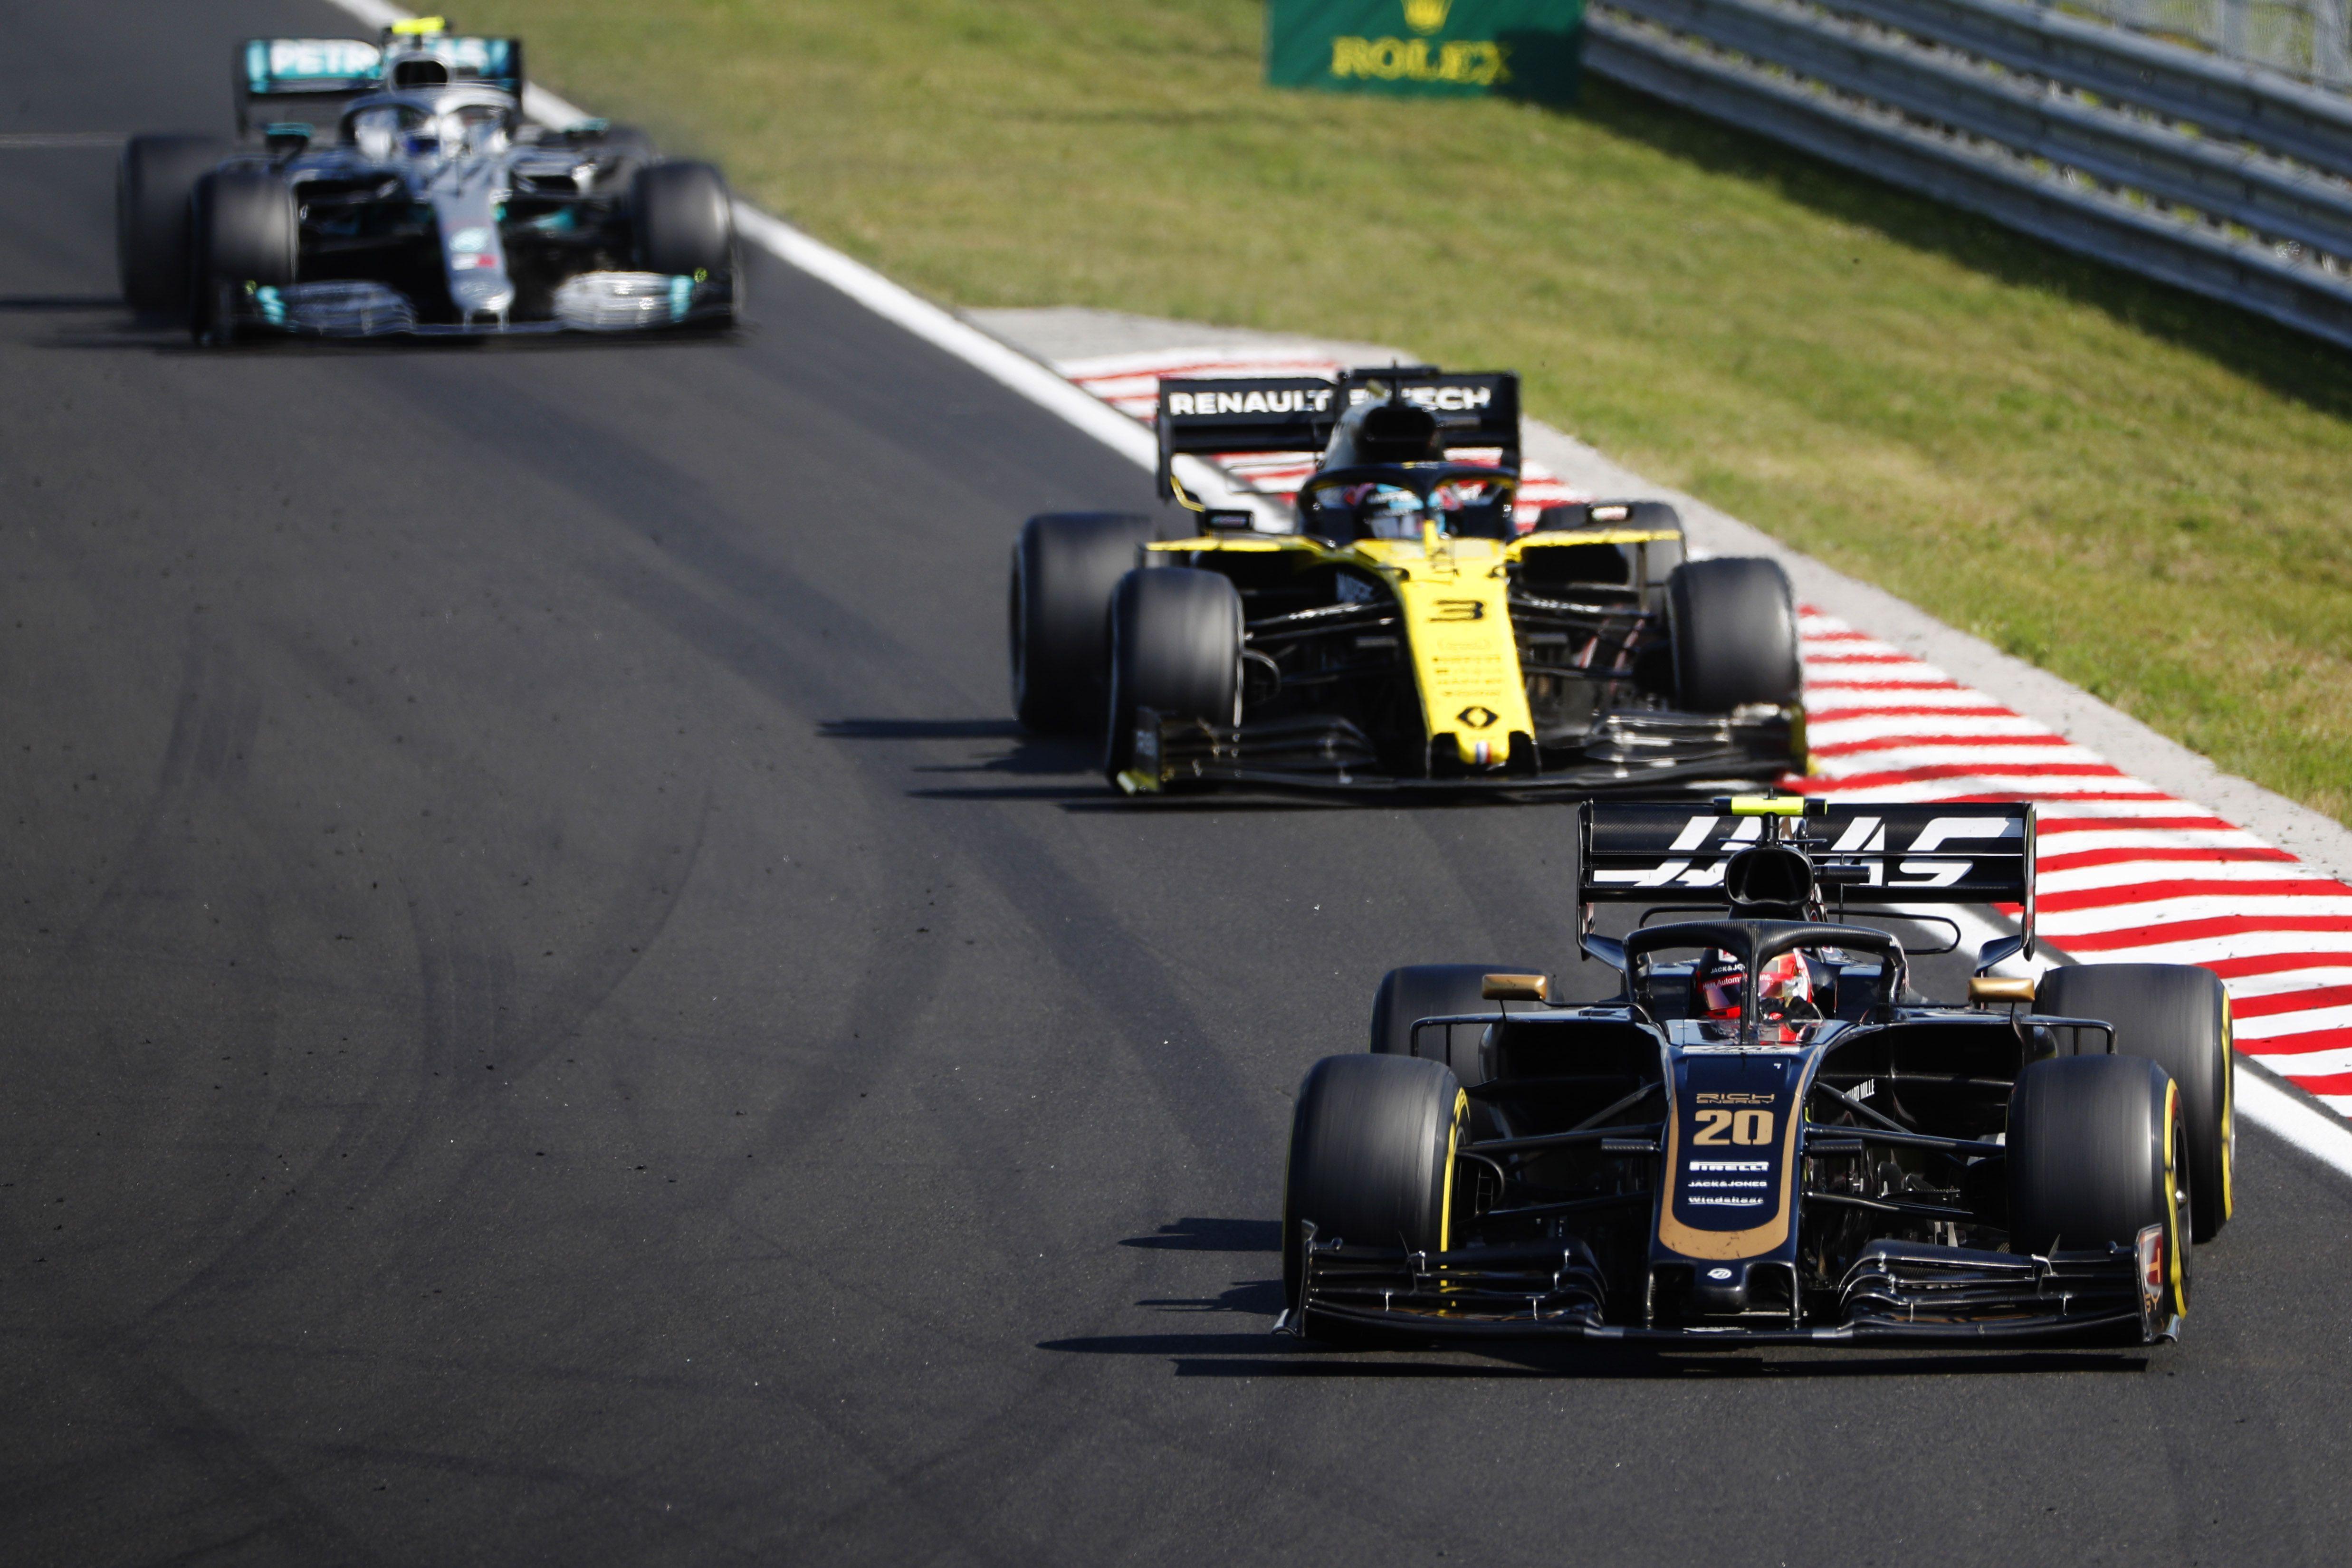 Kevin Magnussen, Romain Grosjean, F1, Hungarian GP